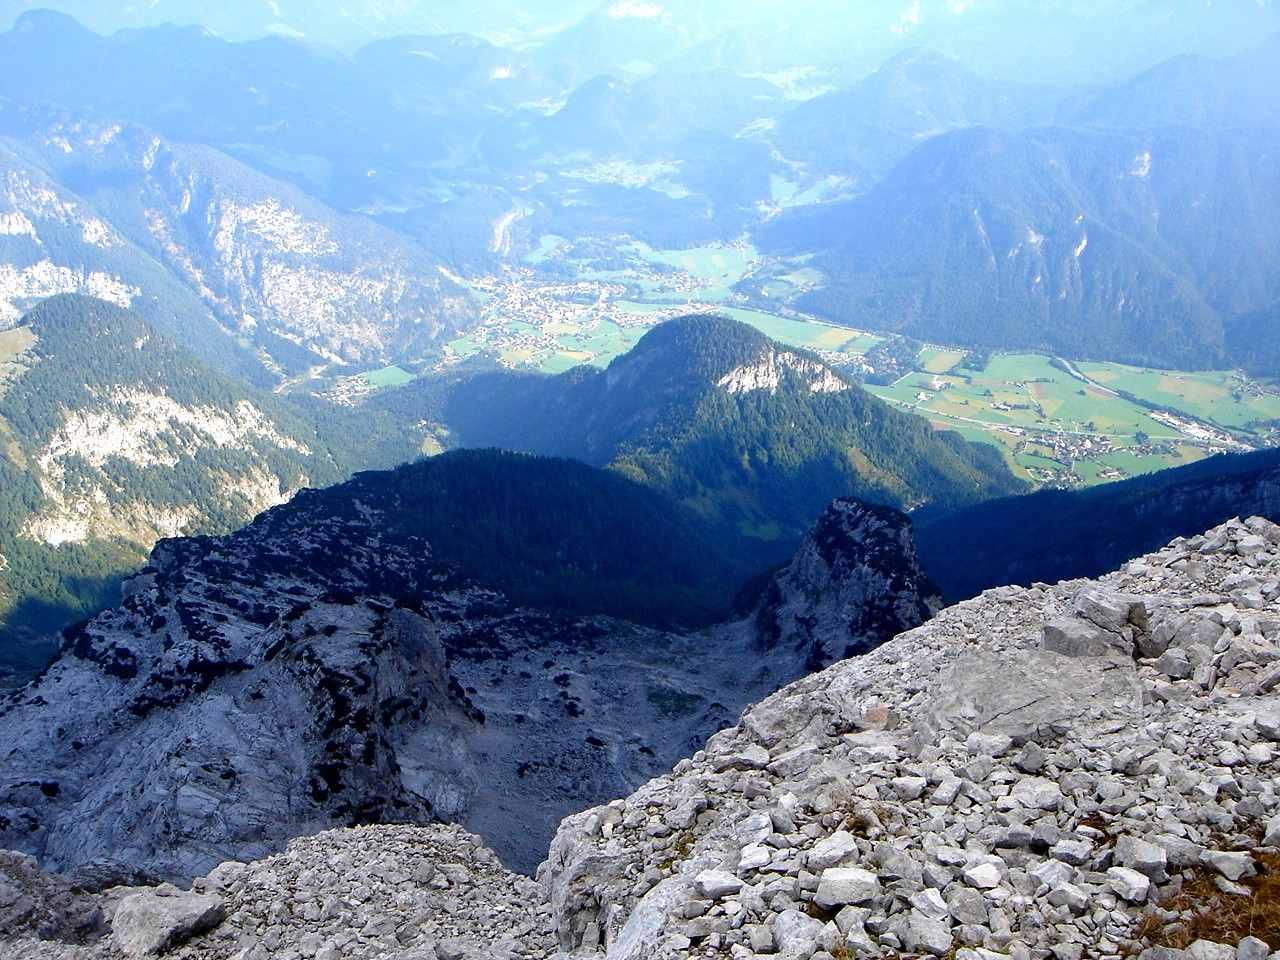 Foto: Manfred Karl / Wander Tour / Großes Ochsenhorn über Schärdinger Steig / Tiefblick nach Lofer / 16.06.2007 00:11:59